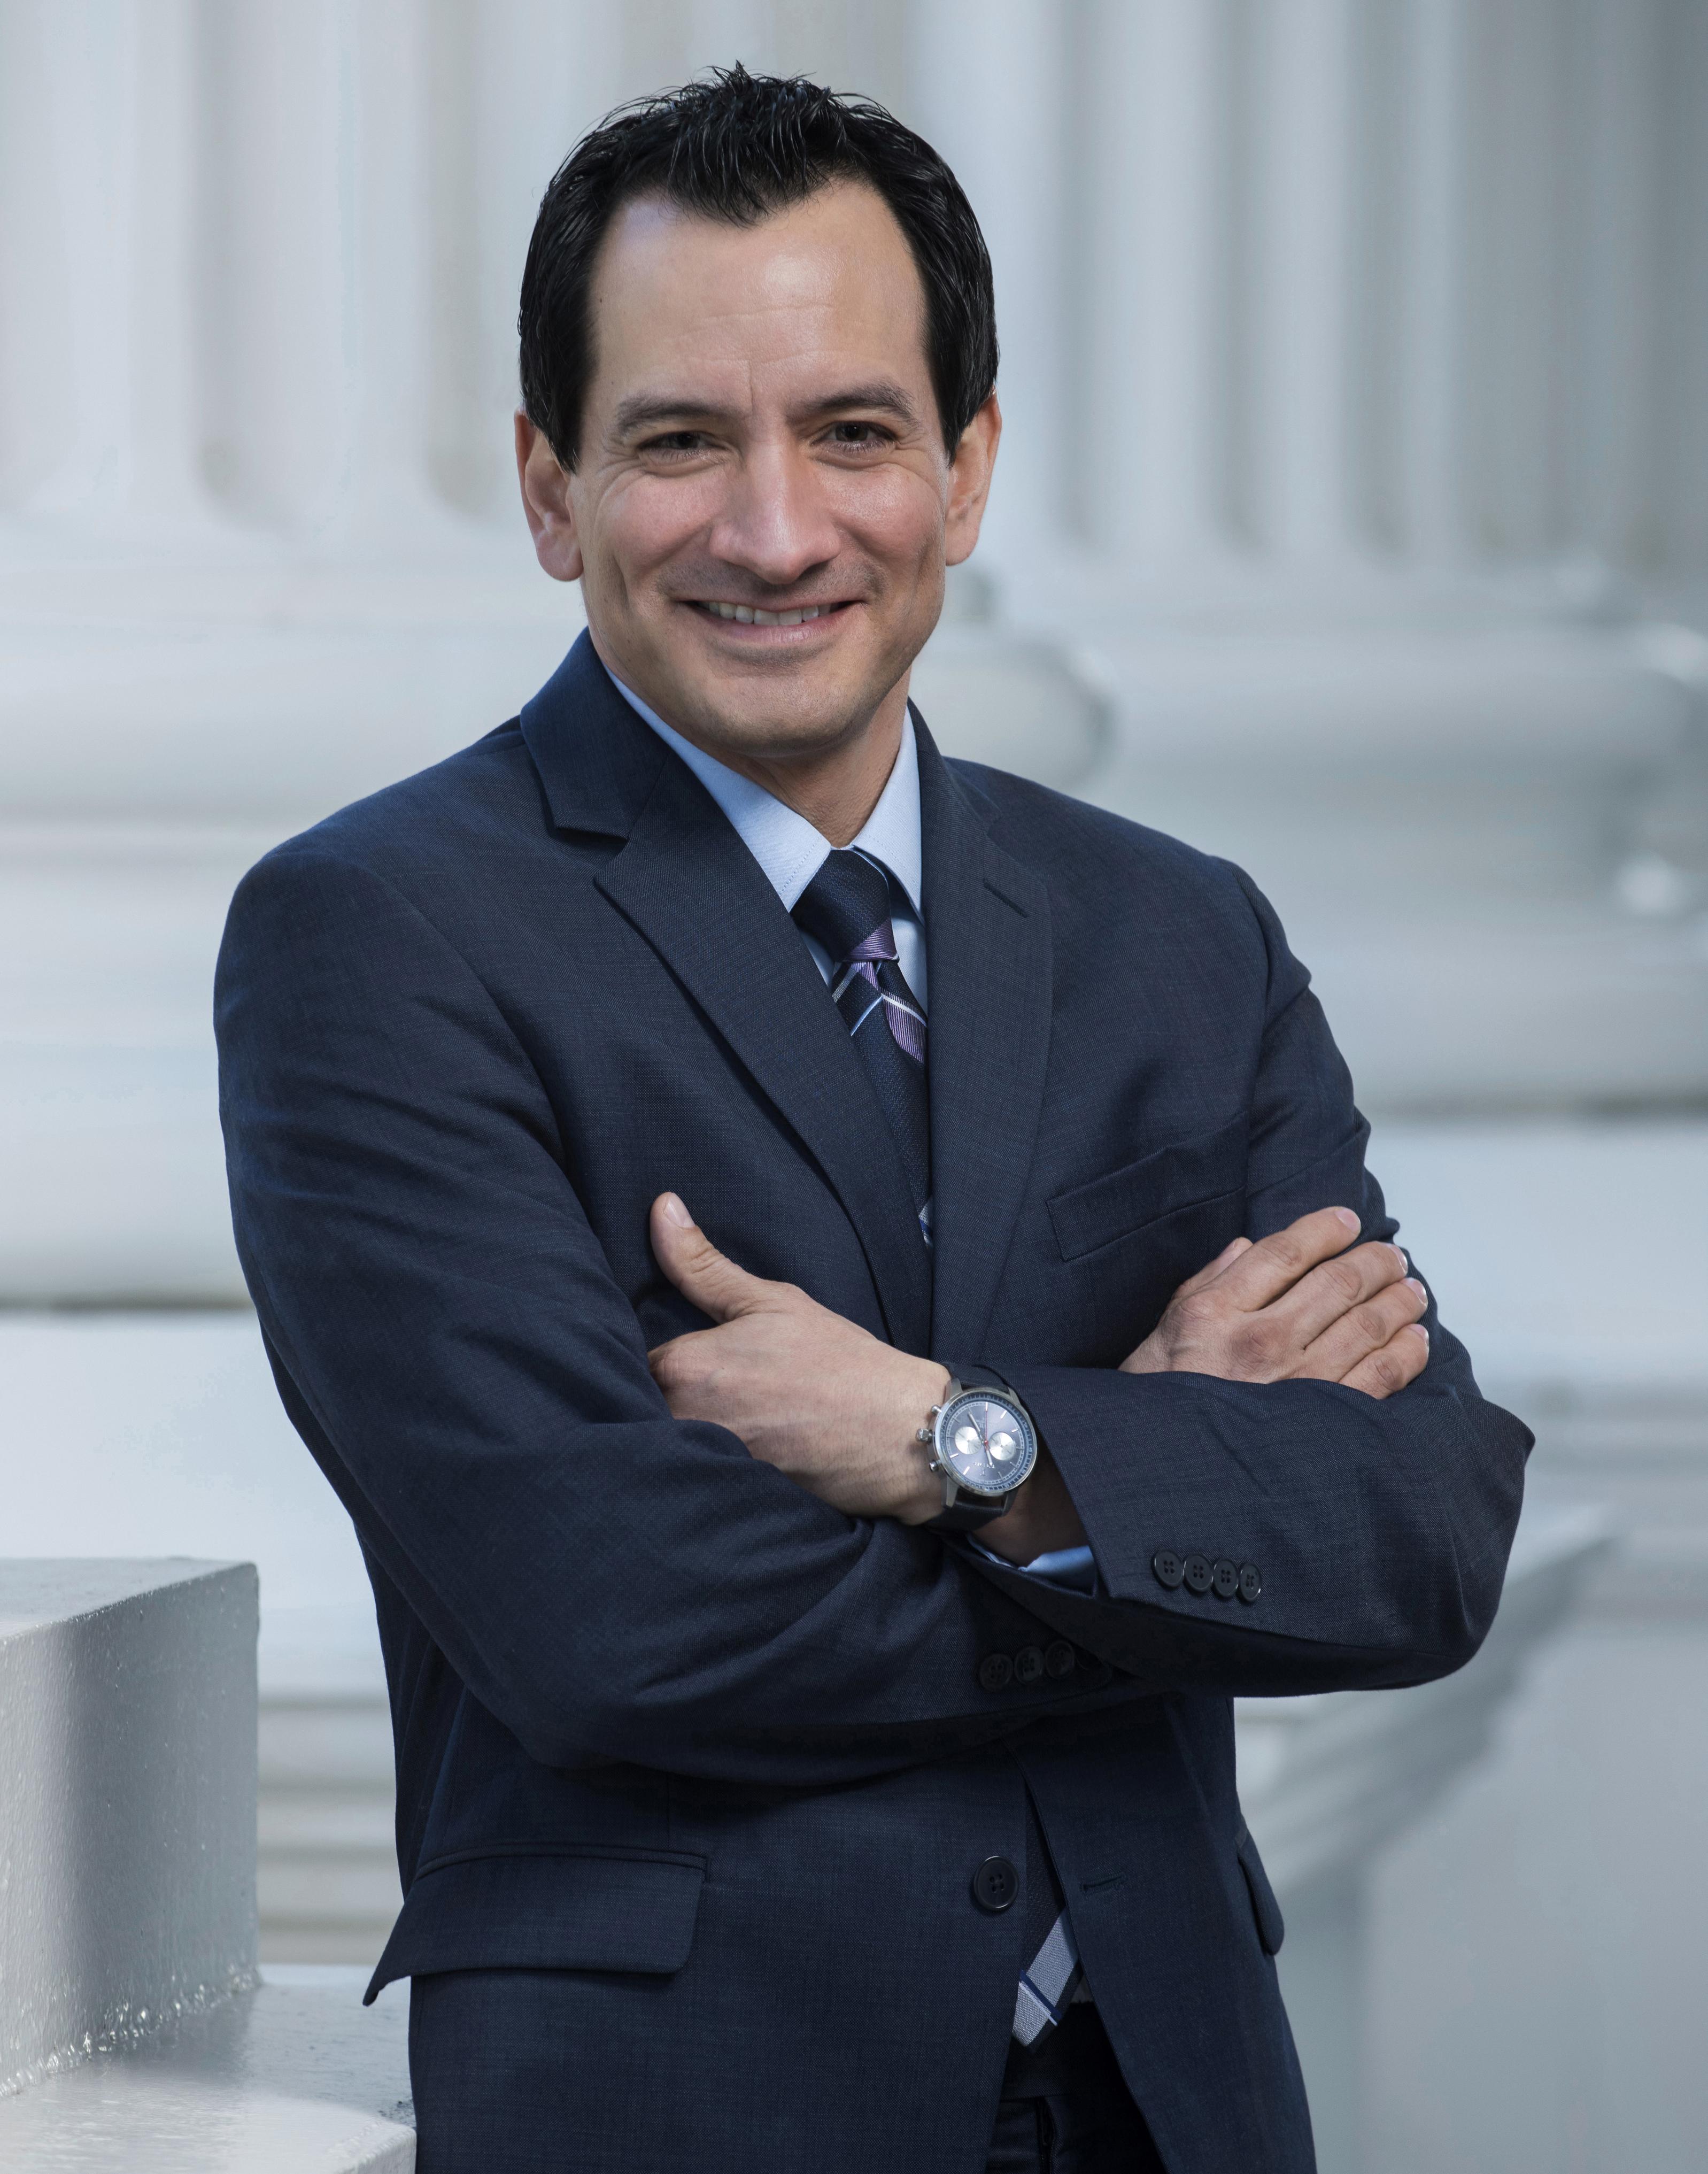 Anthony Rendon (politician) - Wikipedia